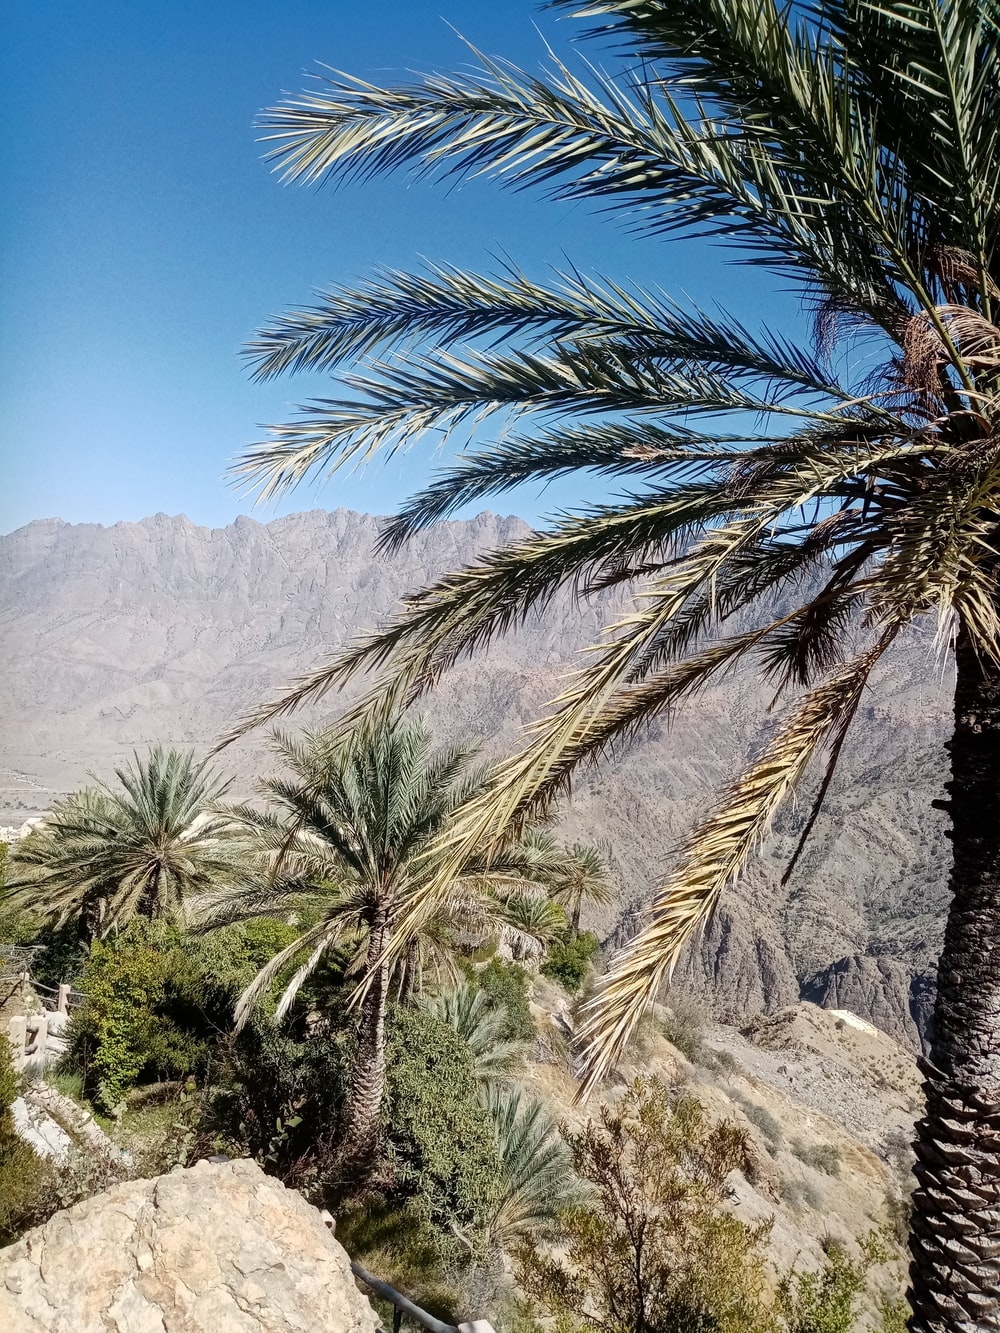 green palm tree near mountain during daytime